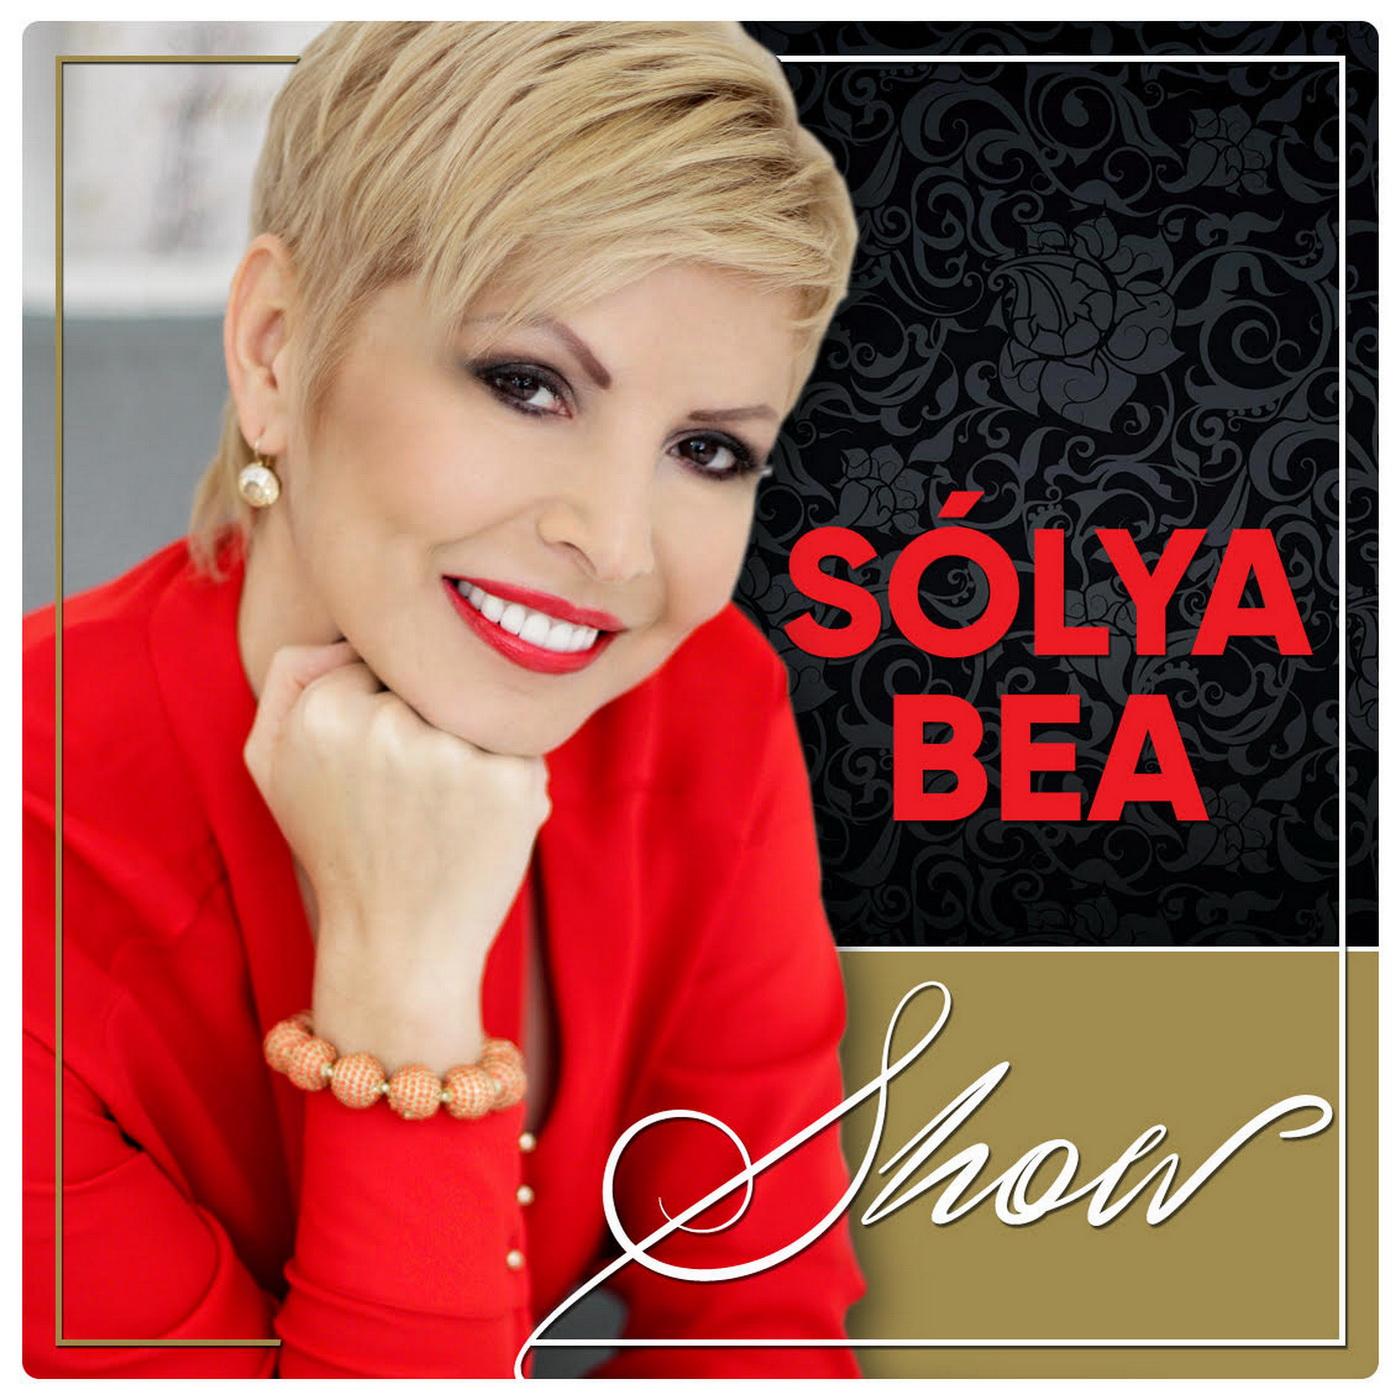 Solyabeashow's podcast